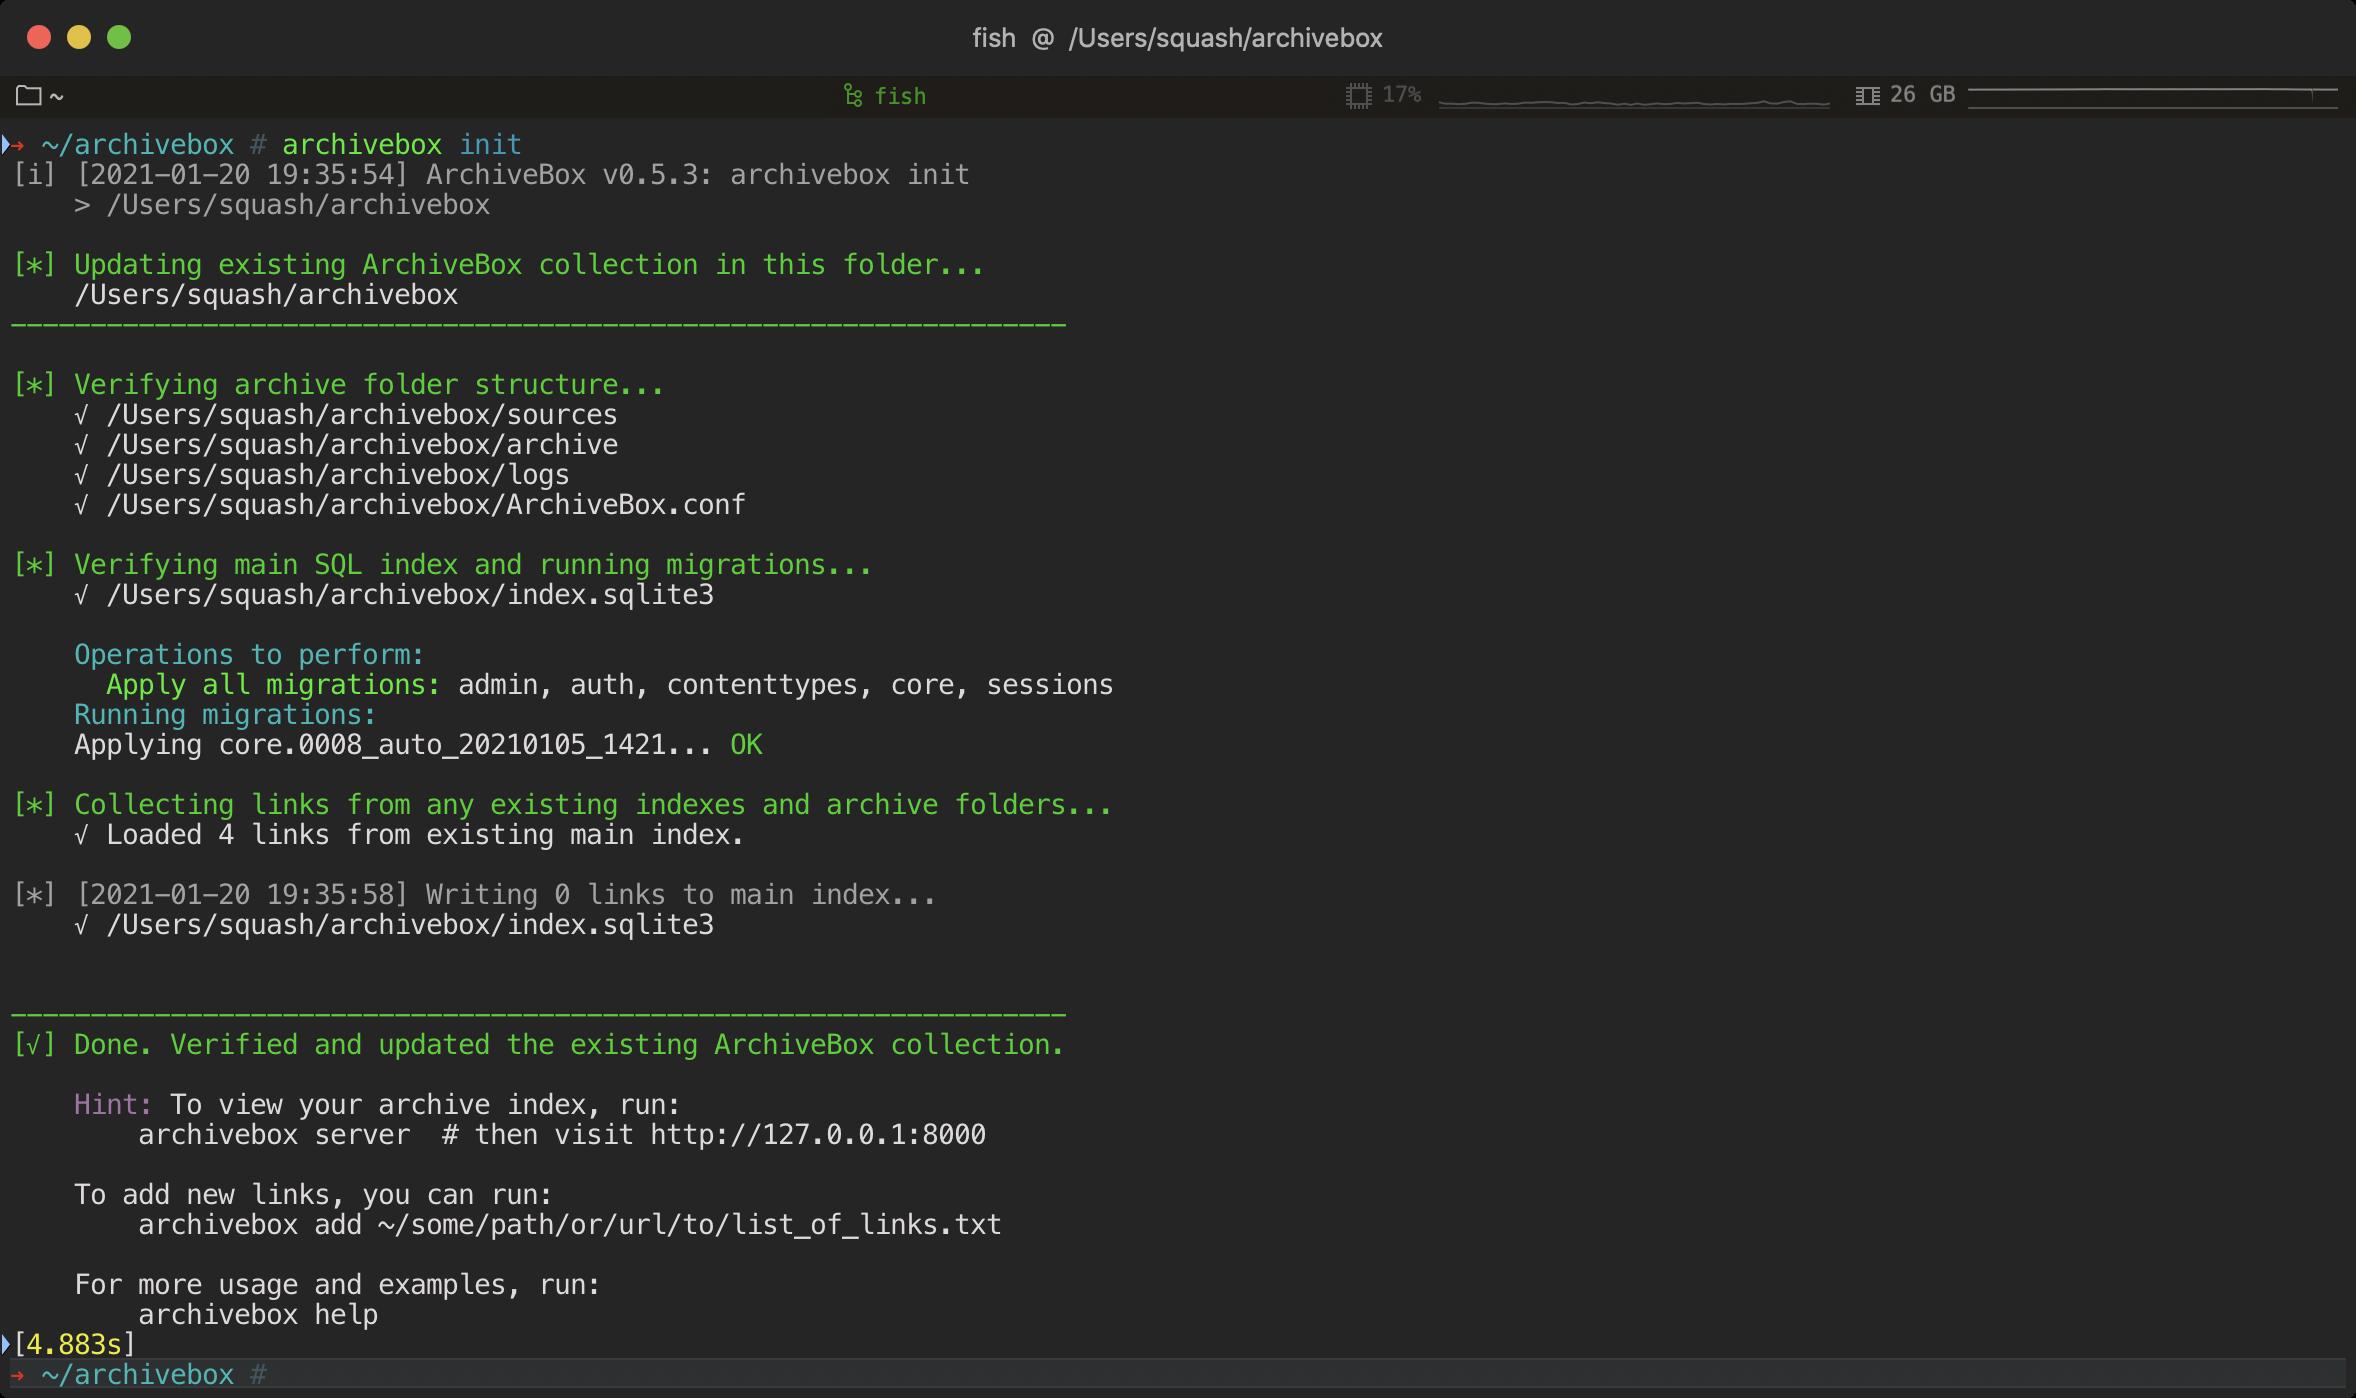 archivebox init